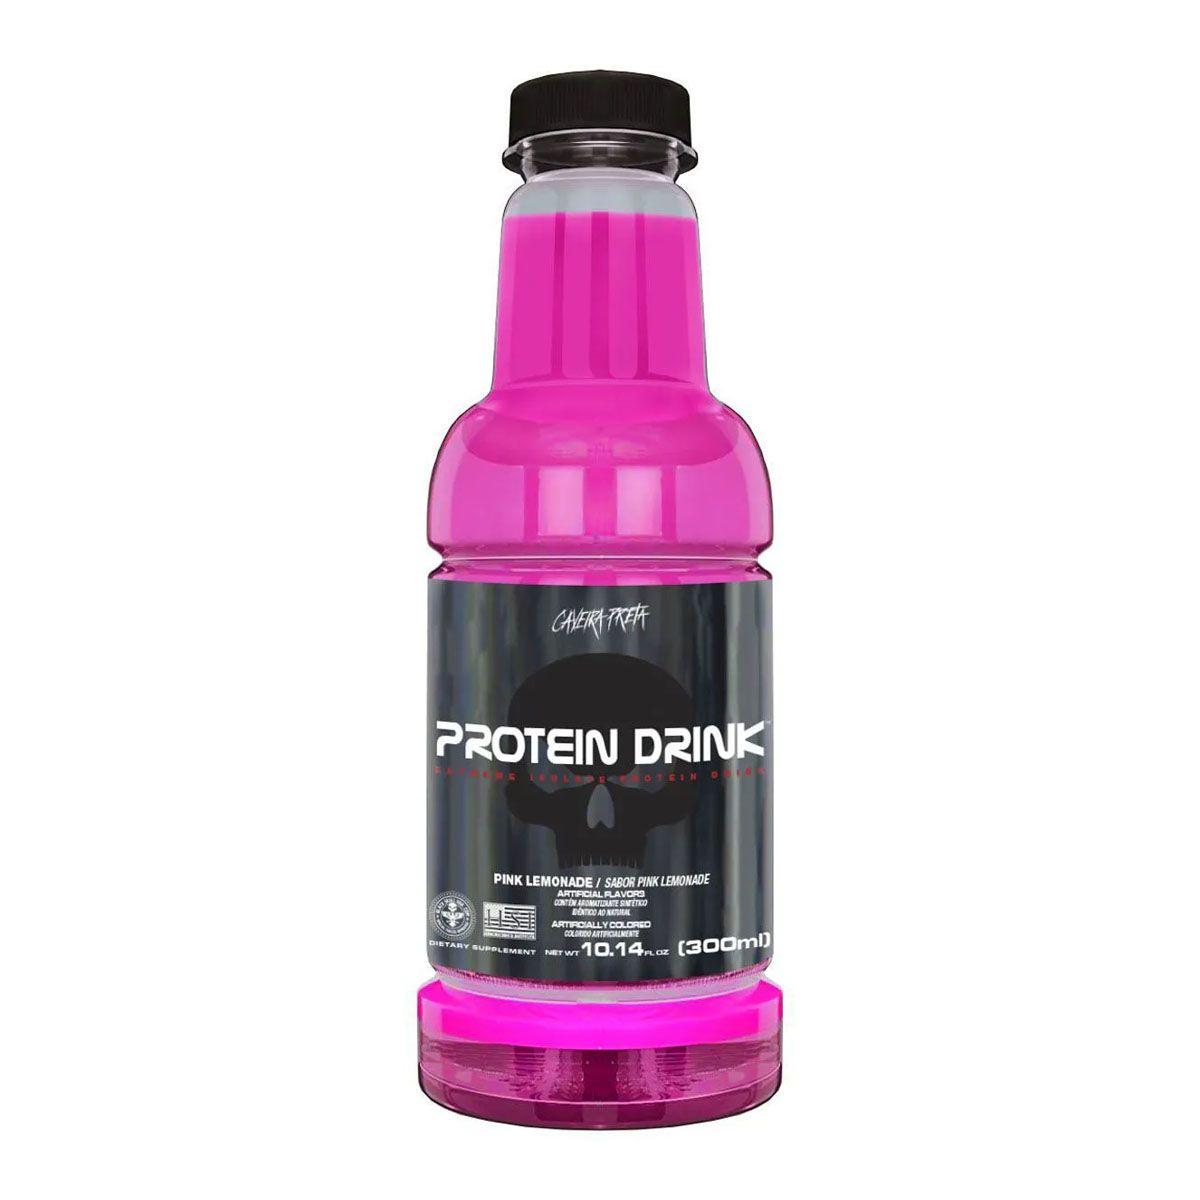 Protein Drink 300ml - Black Skull